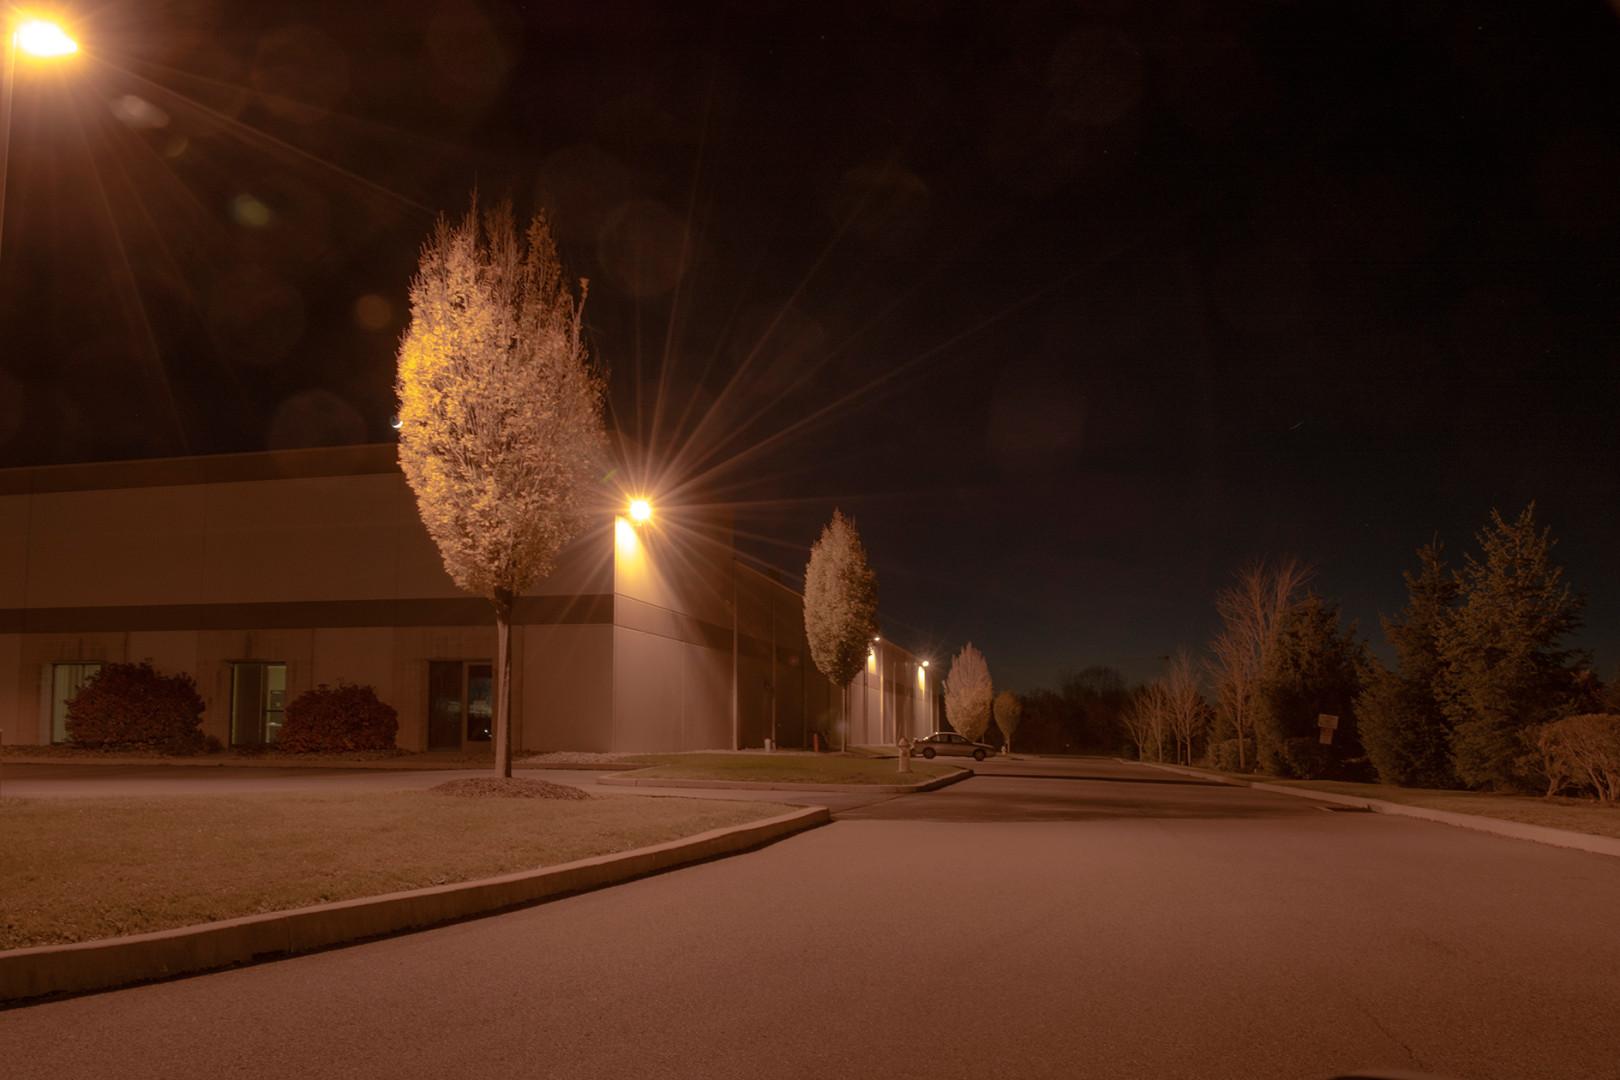 factory night photo noir